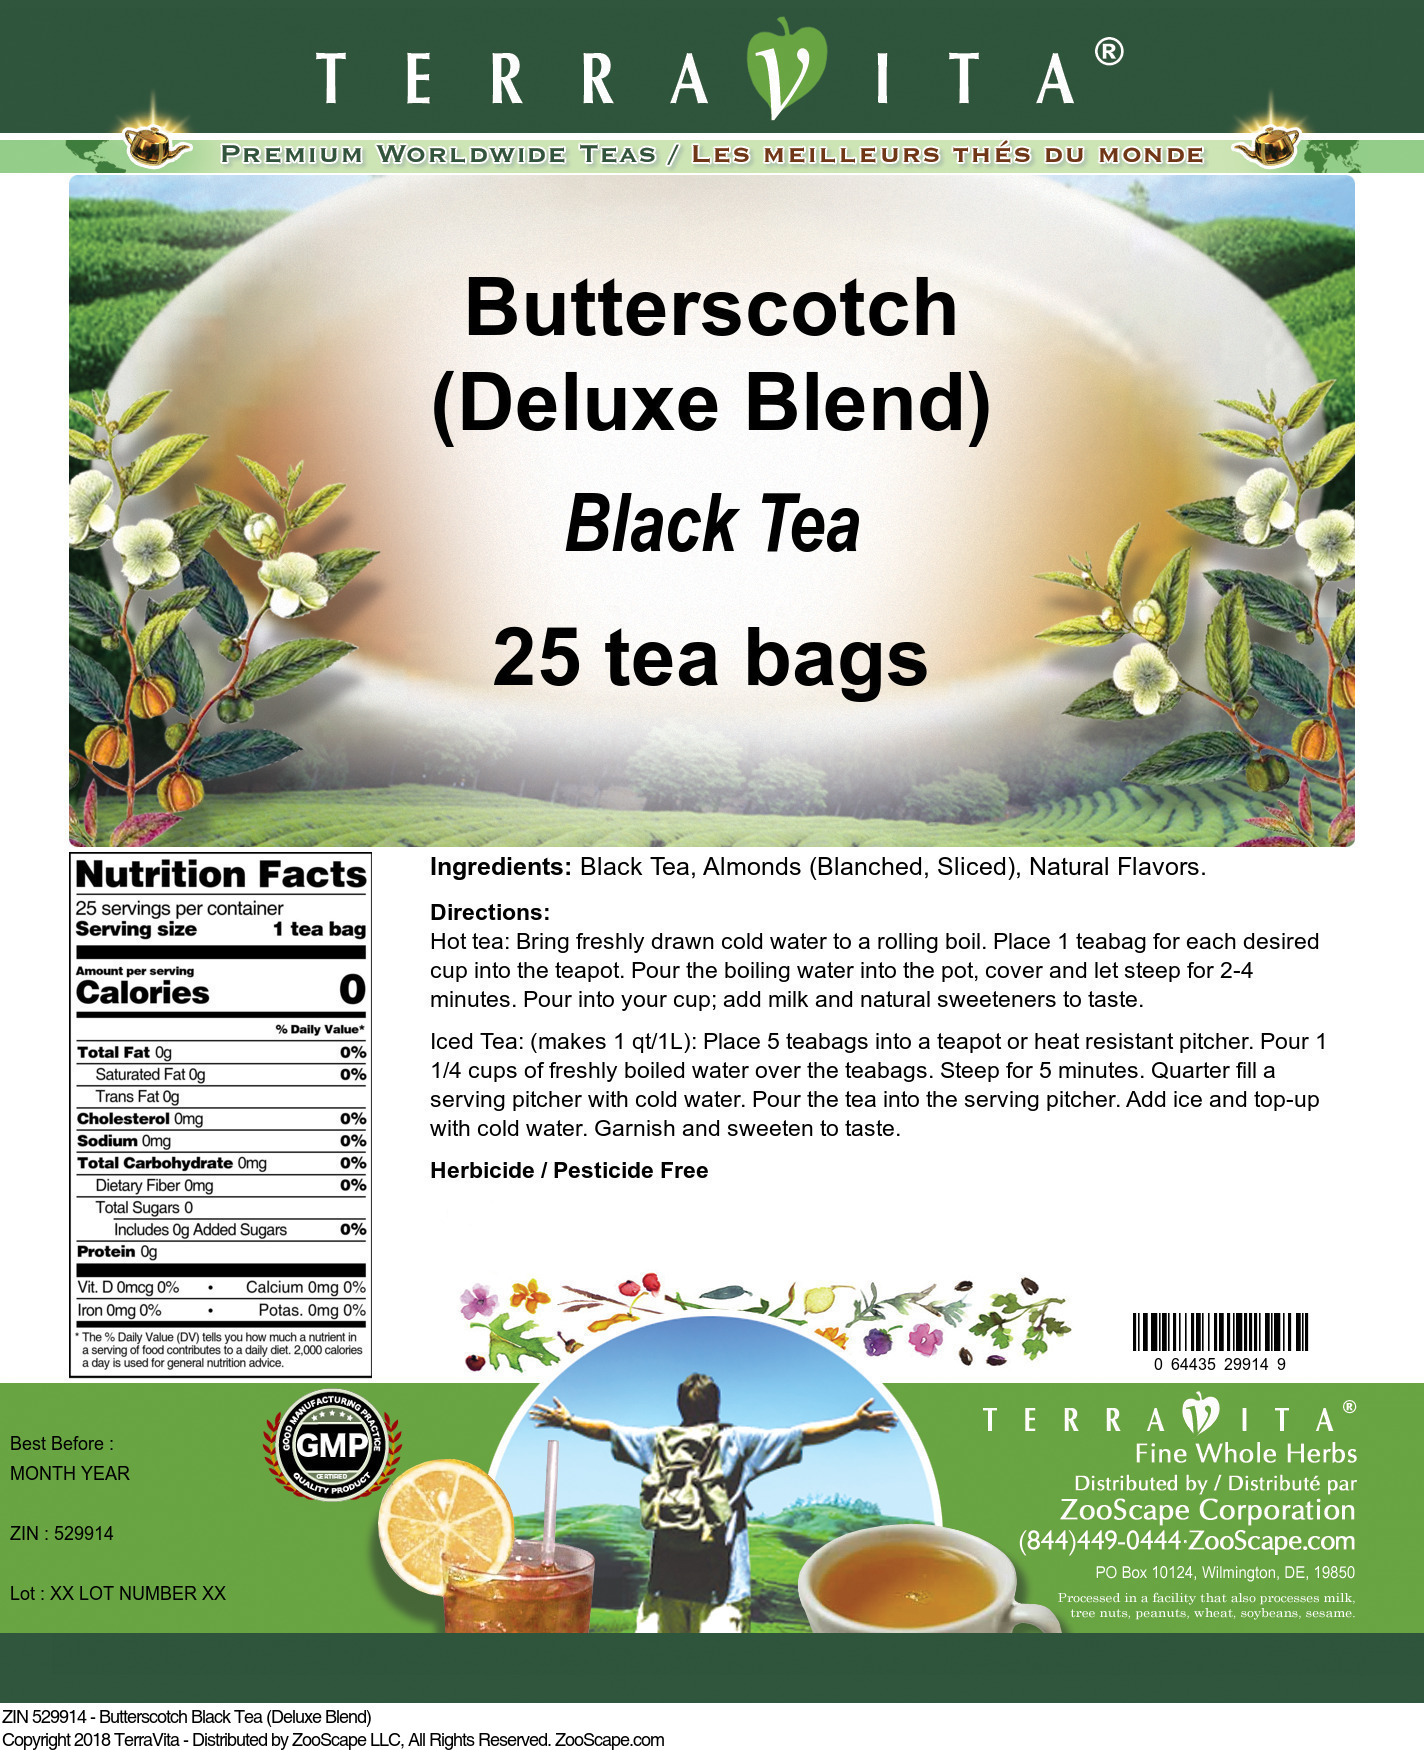 Butterscotch Black Tea (Deluxe Blend)